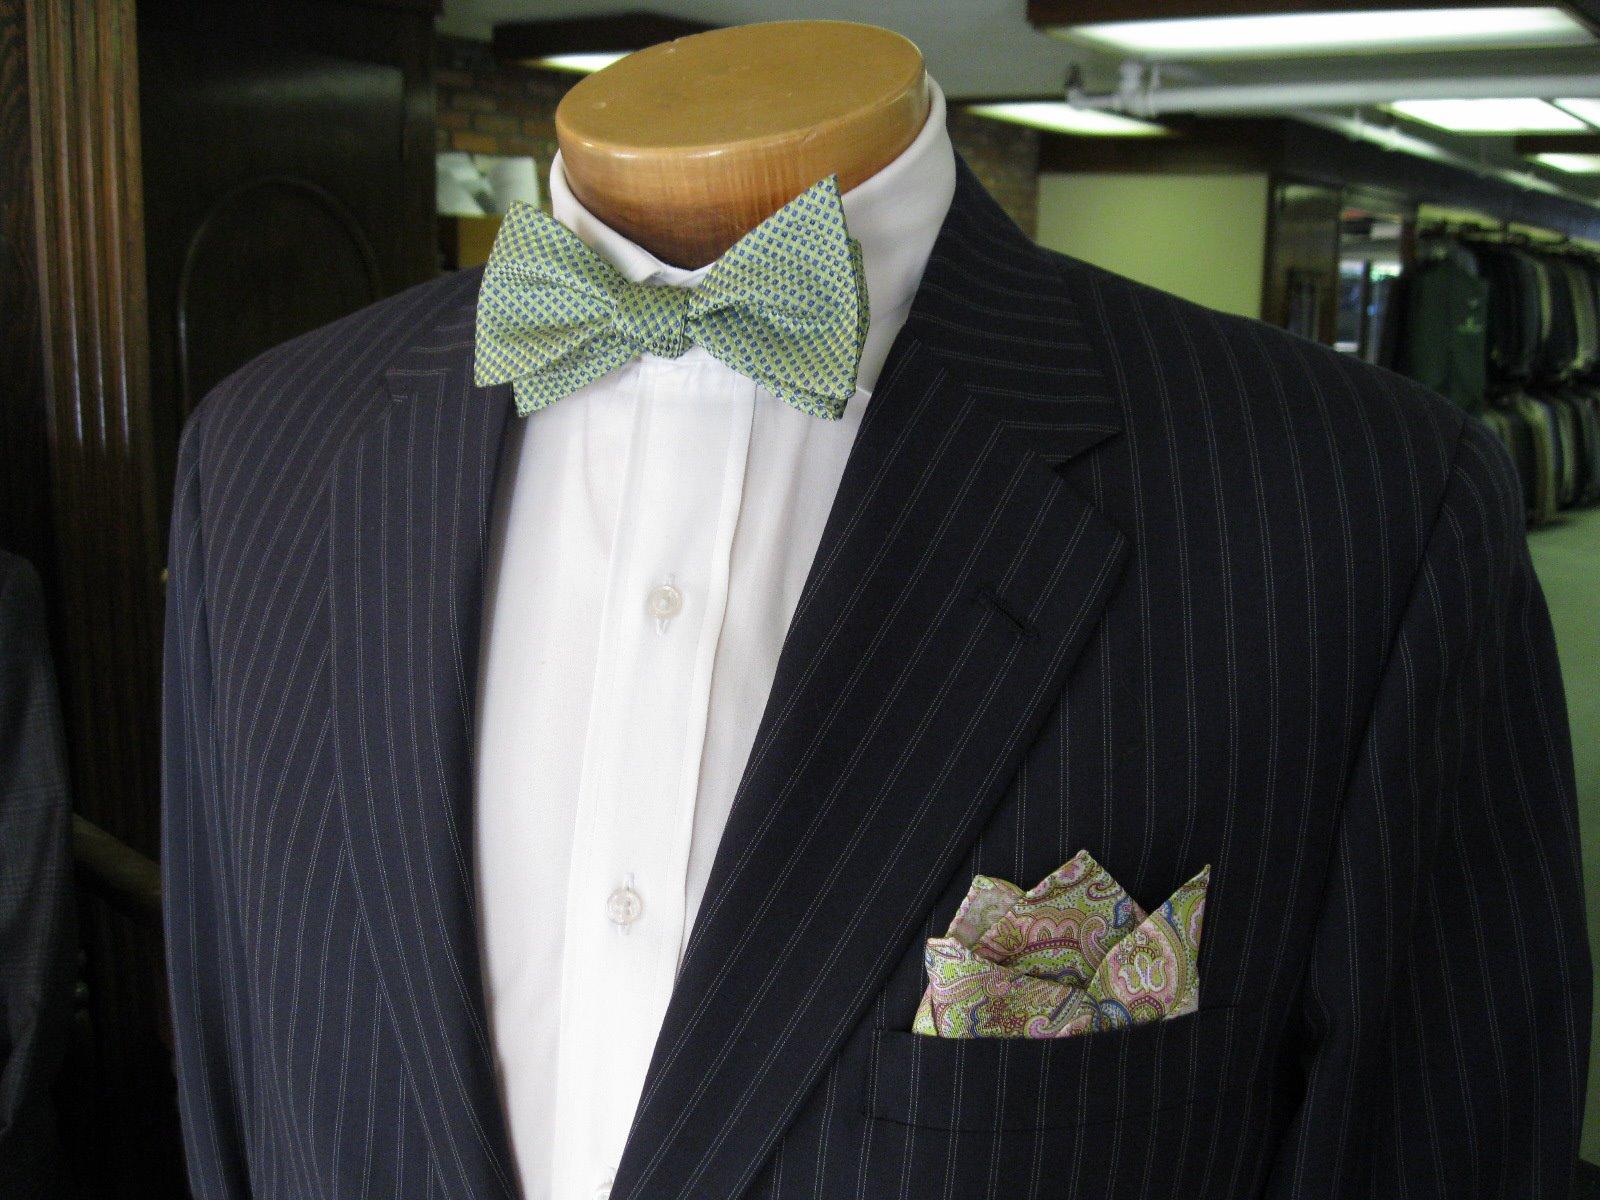 Chancellor's Clothing Store   Visit Columbus, GA